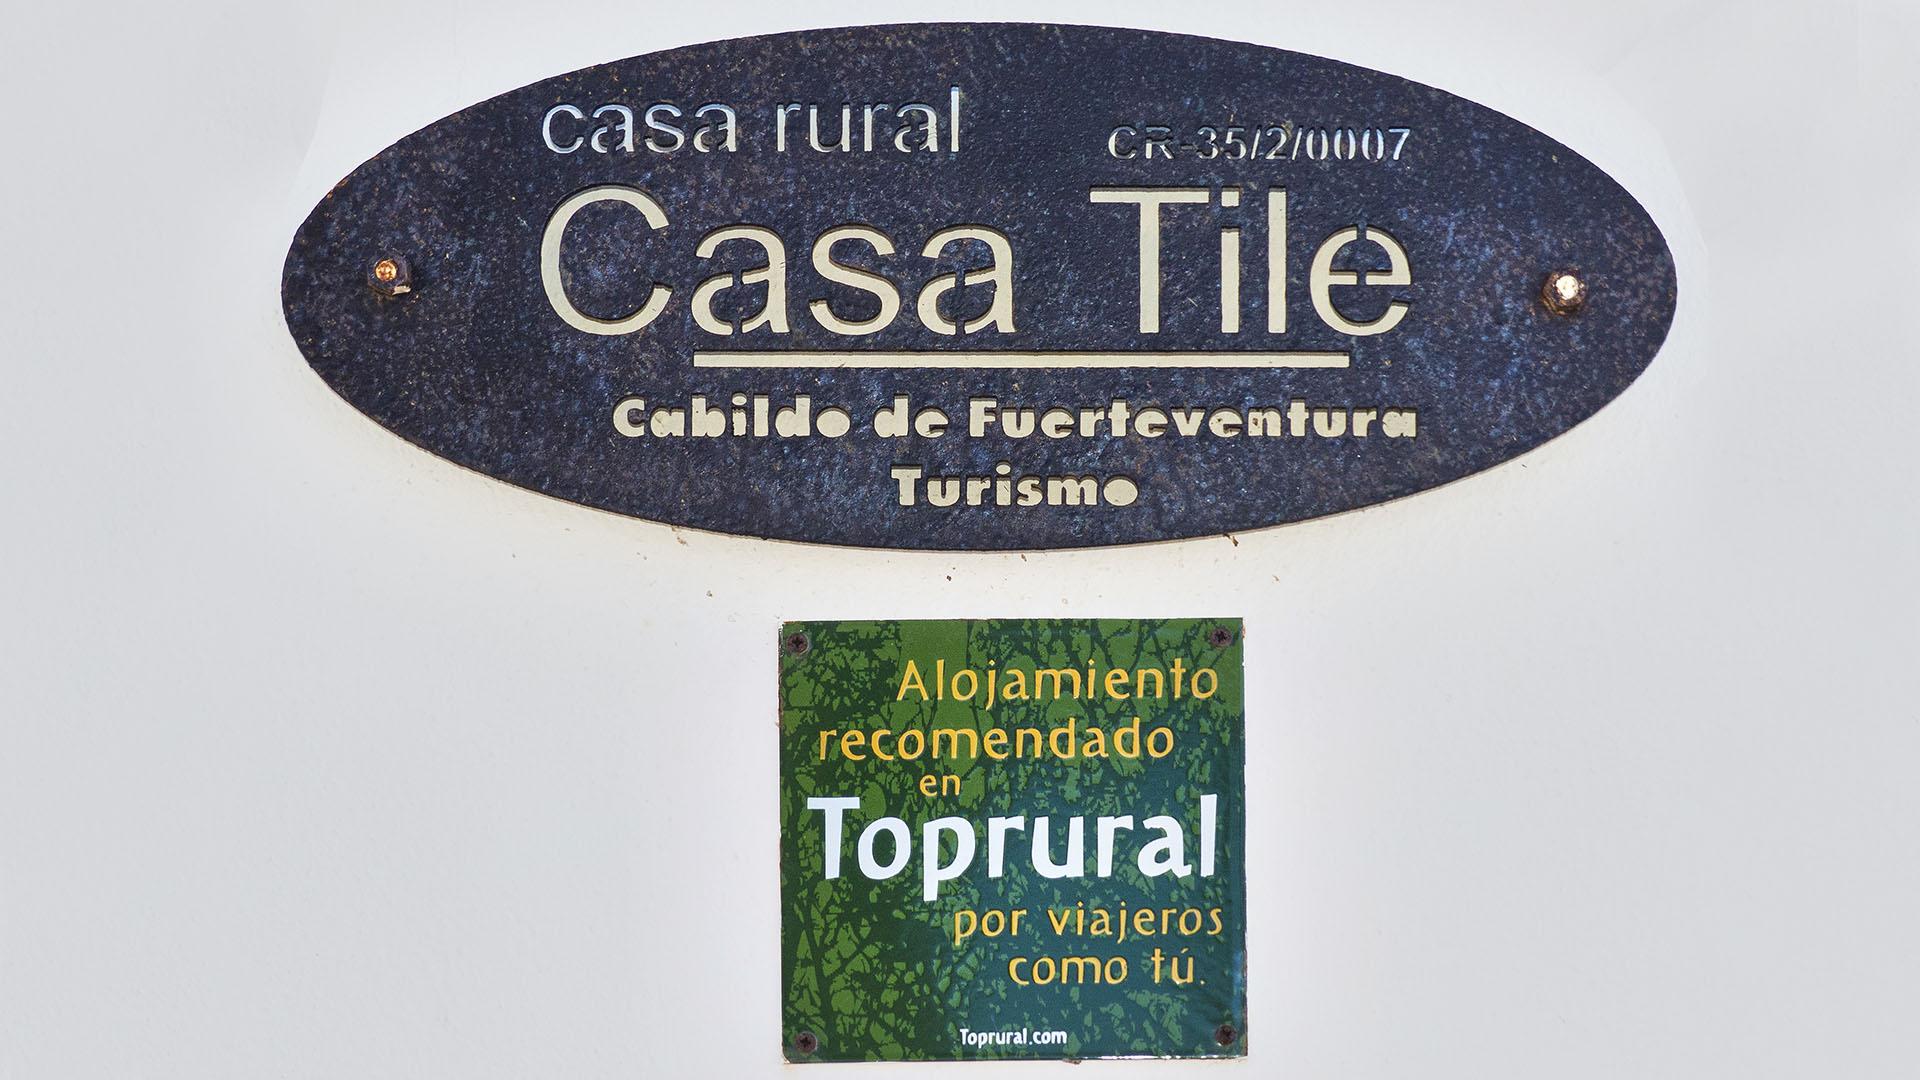 Casa Rural - Toprural Cabildo de Fuerteventura Turismo.